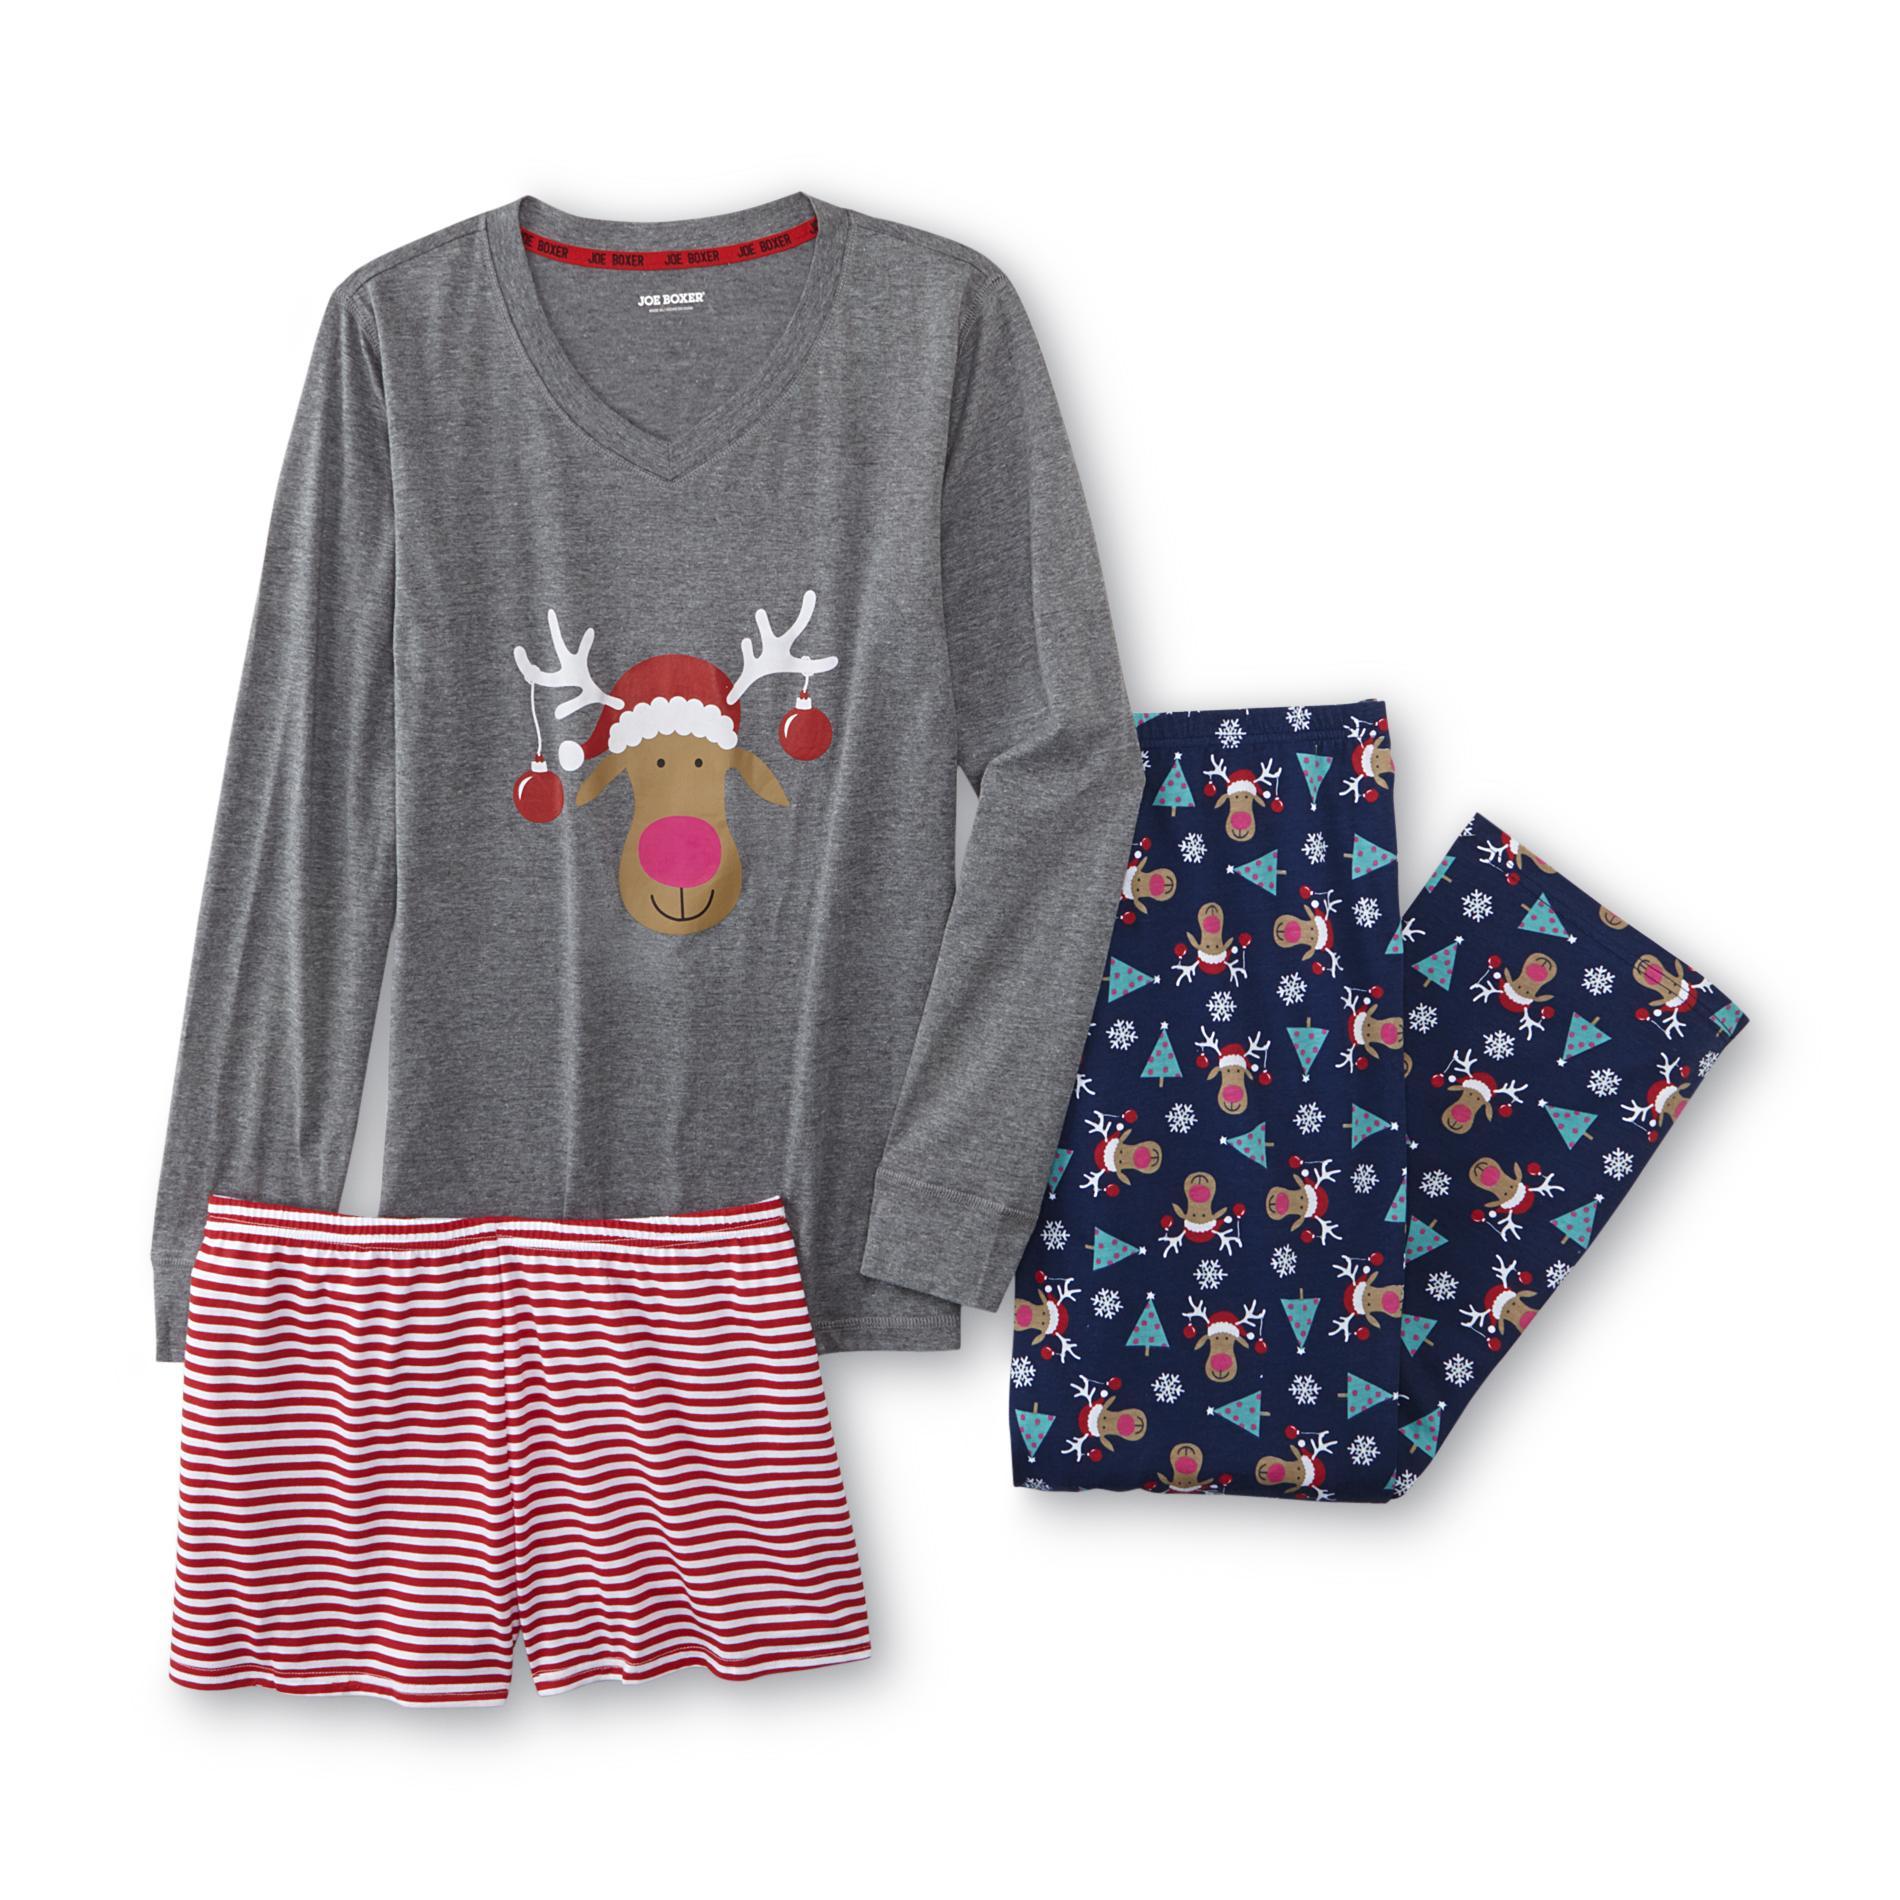 Joe Boxer Junior's Plus Christmas Pajama Top Pants & Shorts - Reindeer